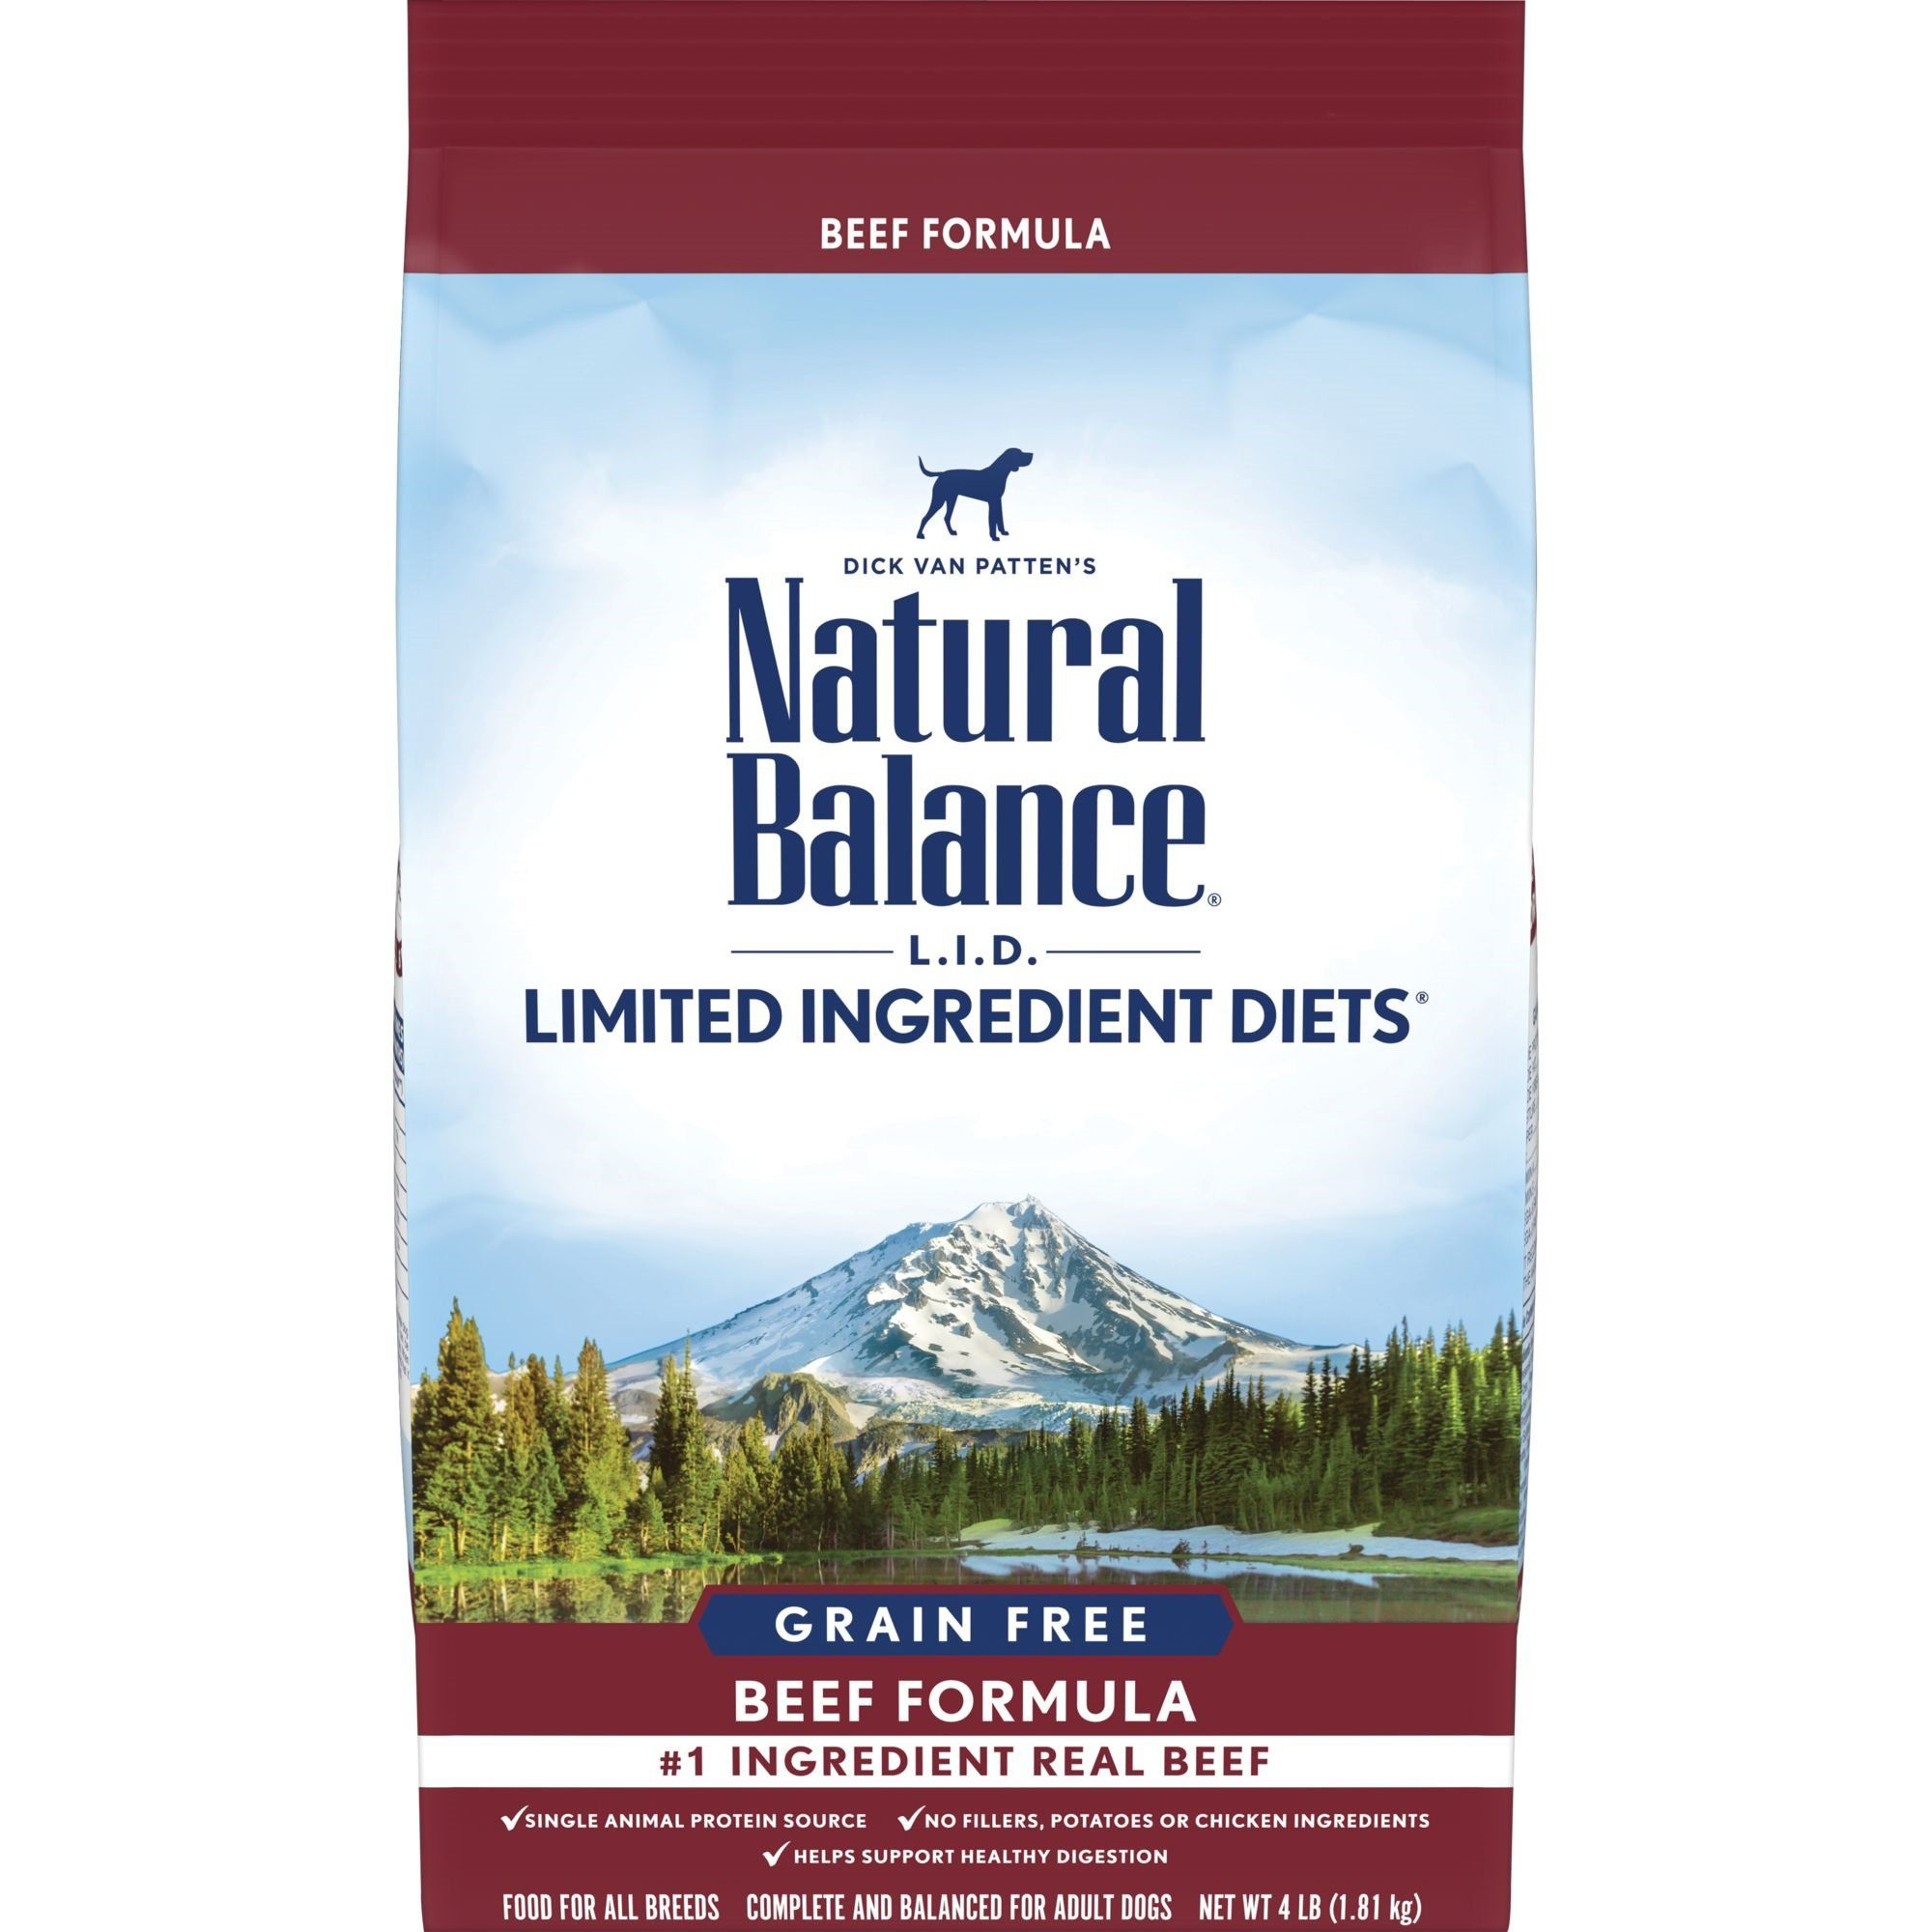 Natural Balance Limited Ingredient Diet Grain Free Beef Formula